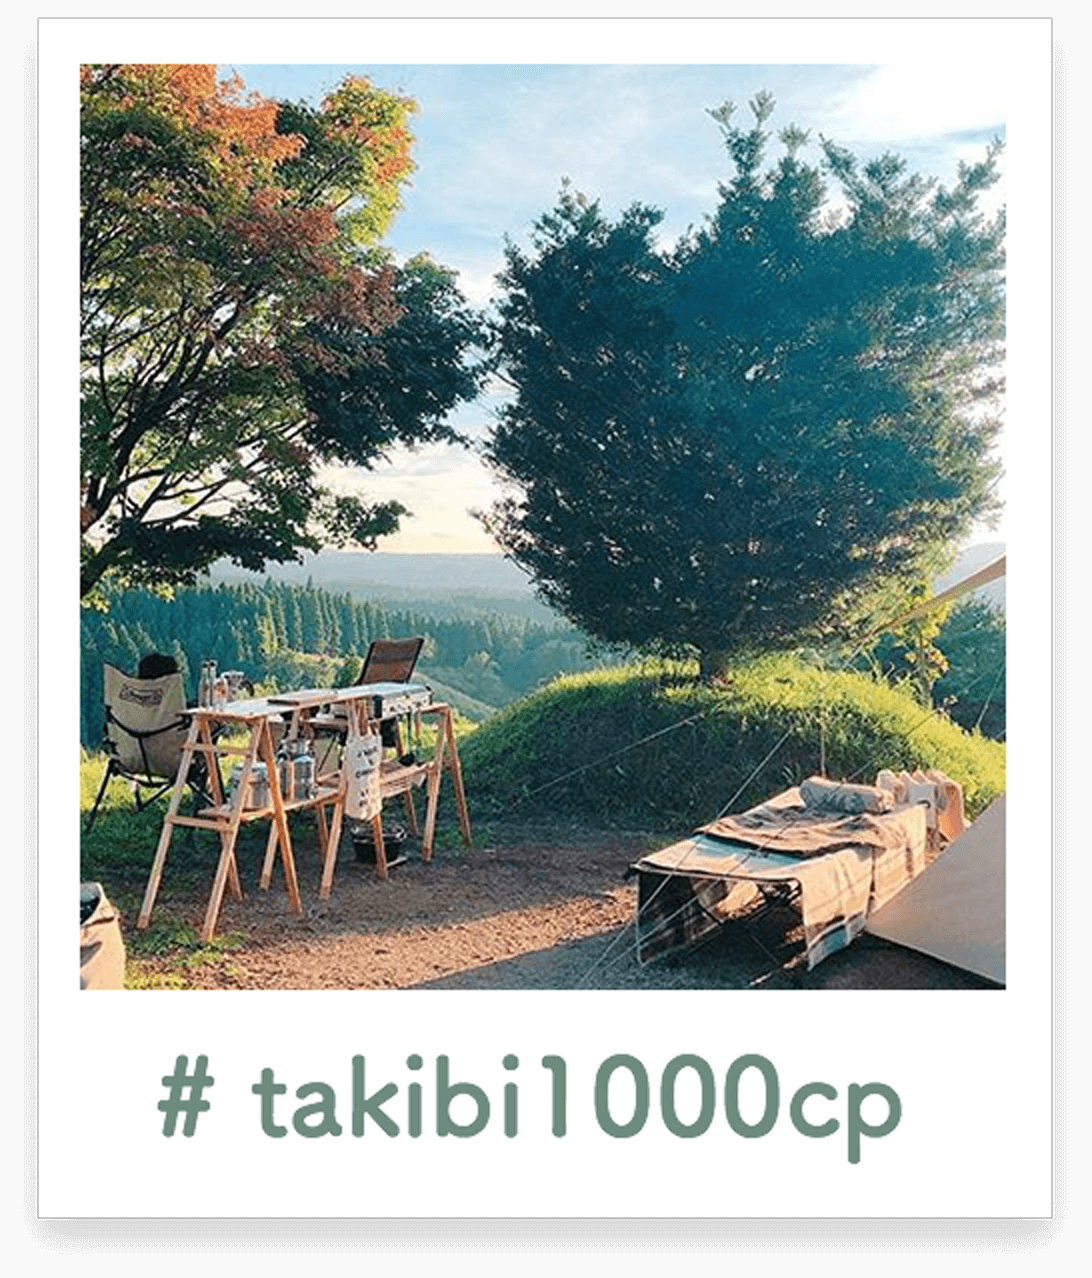 #takibi1000cp